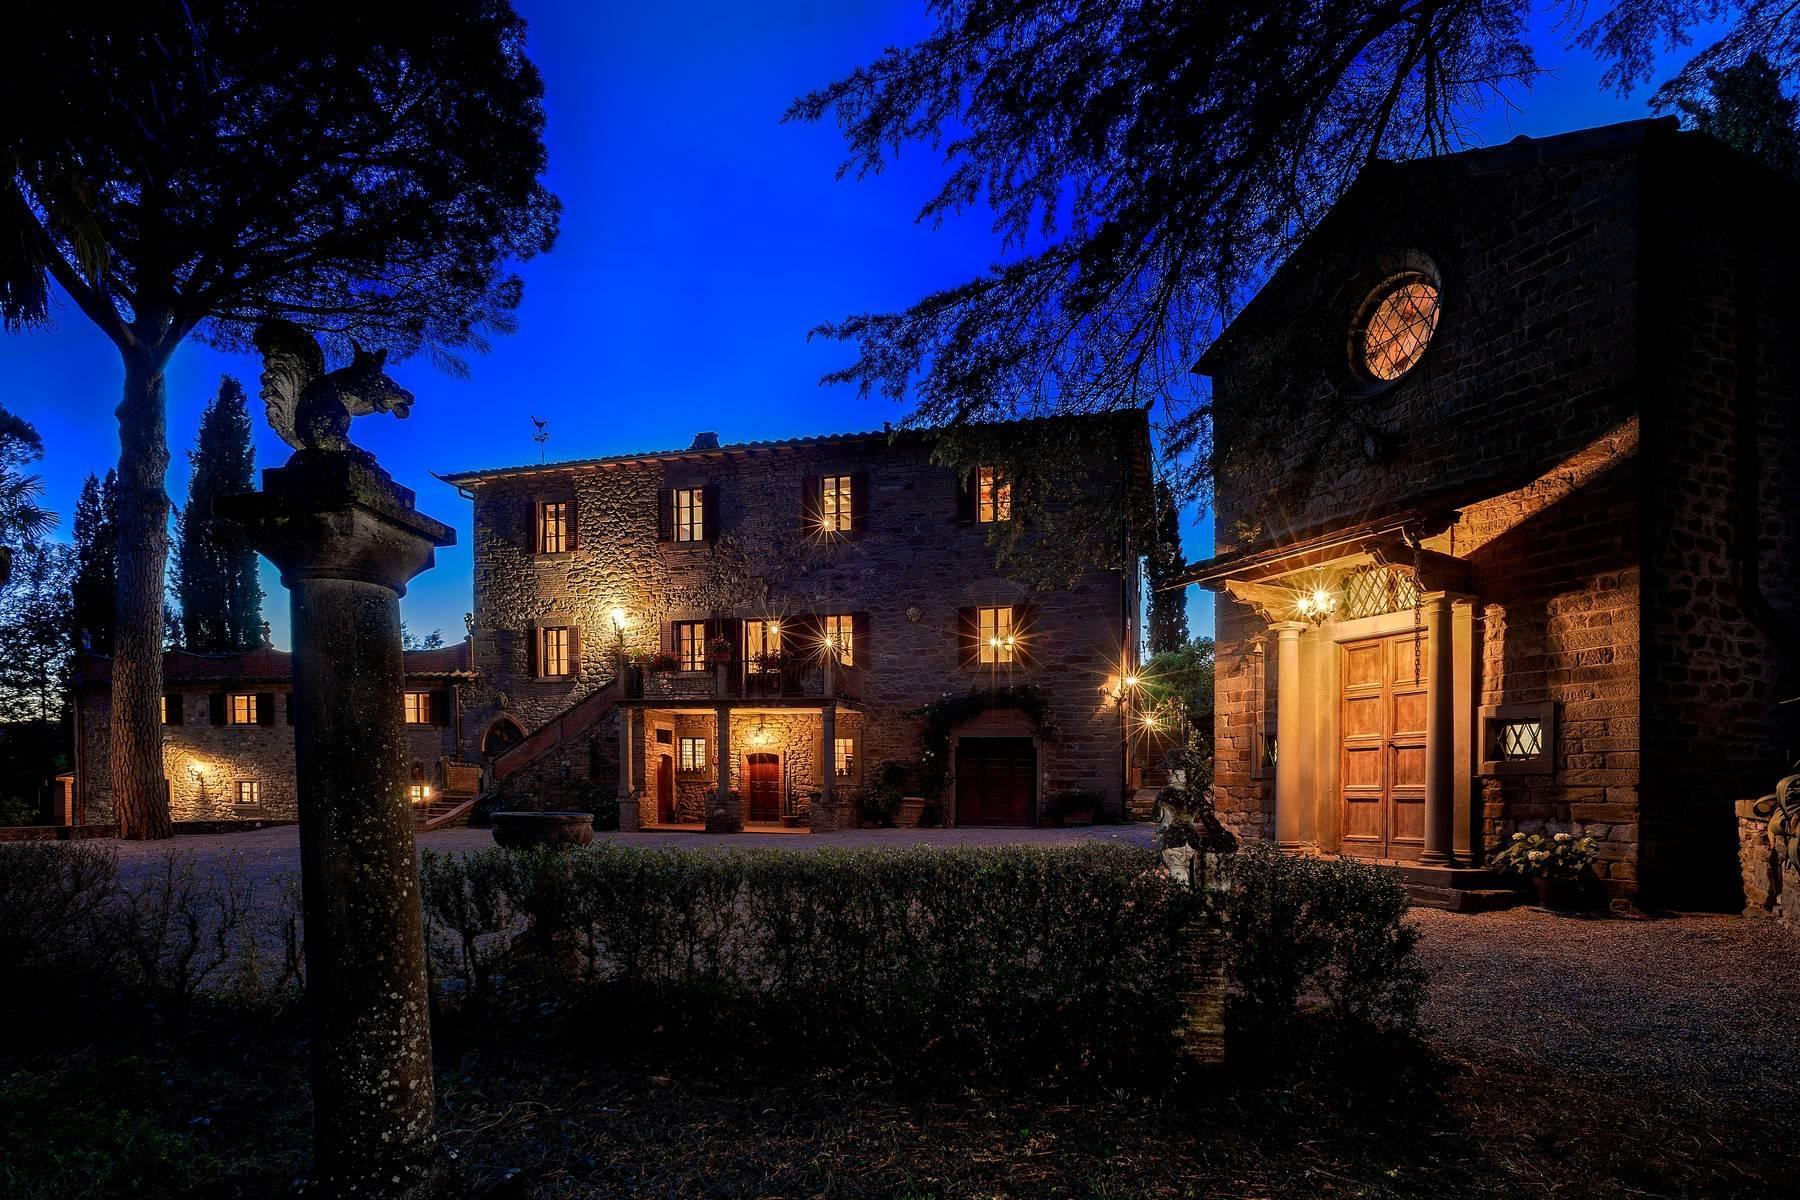 Historische Villa aus dem 1700 in Cortona - 4